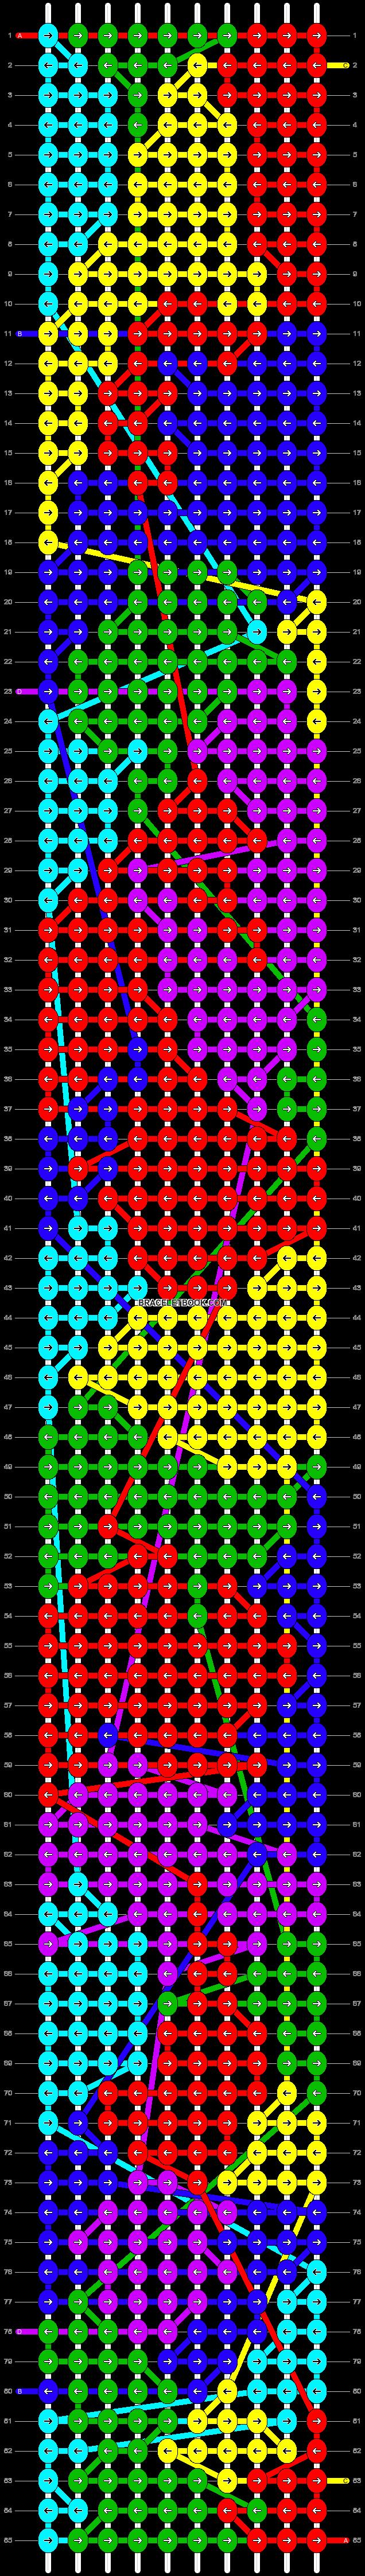 Alpha Pattern #22588 added by nastyapan